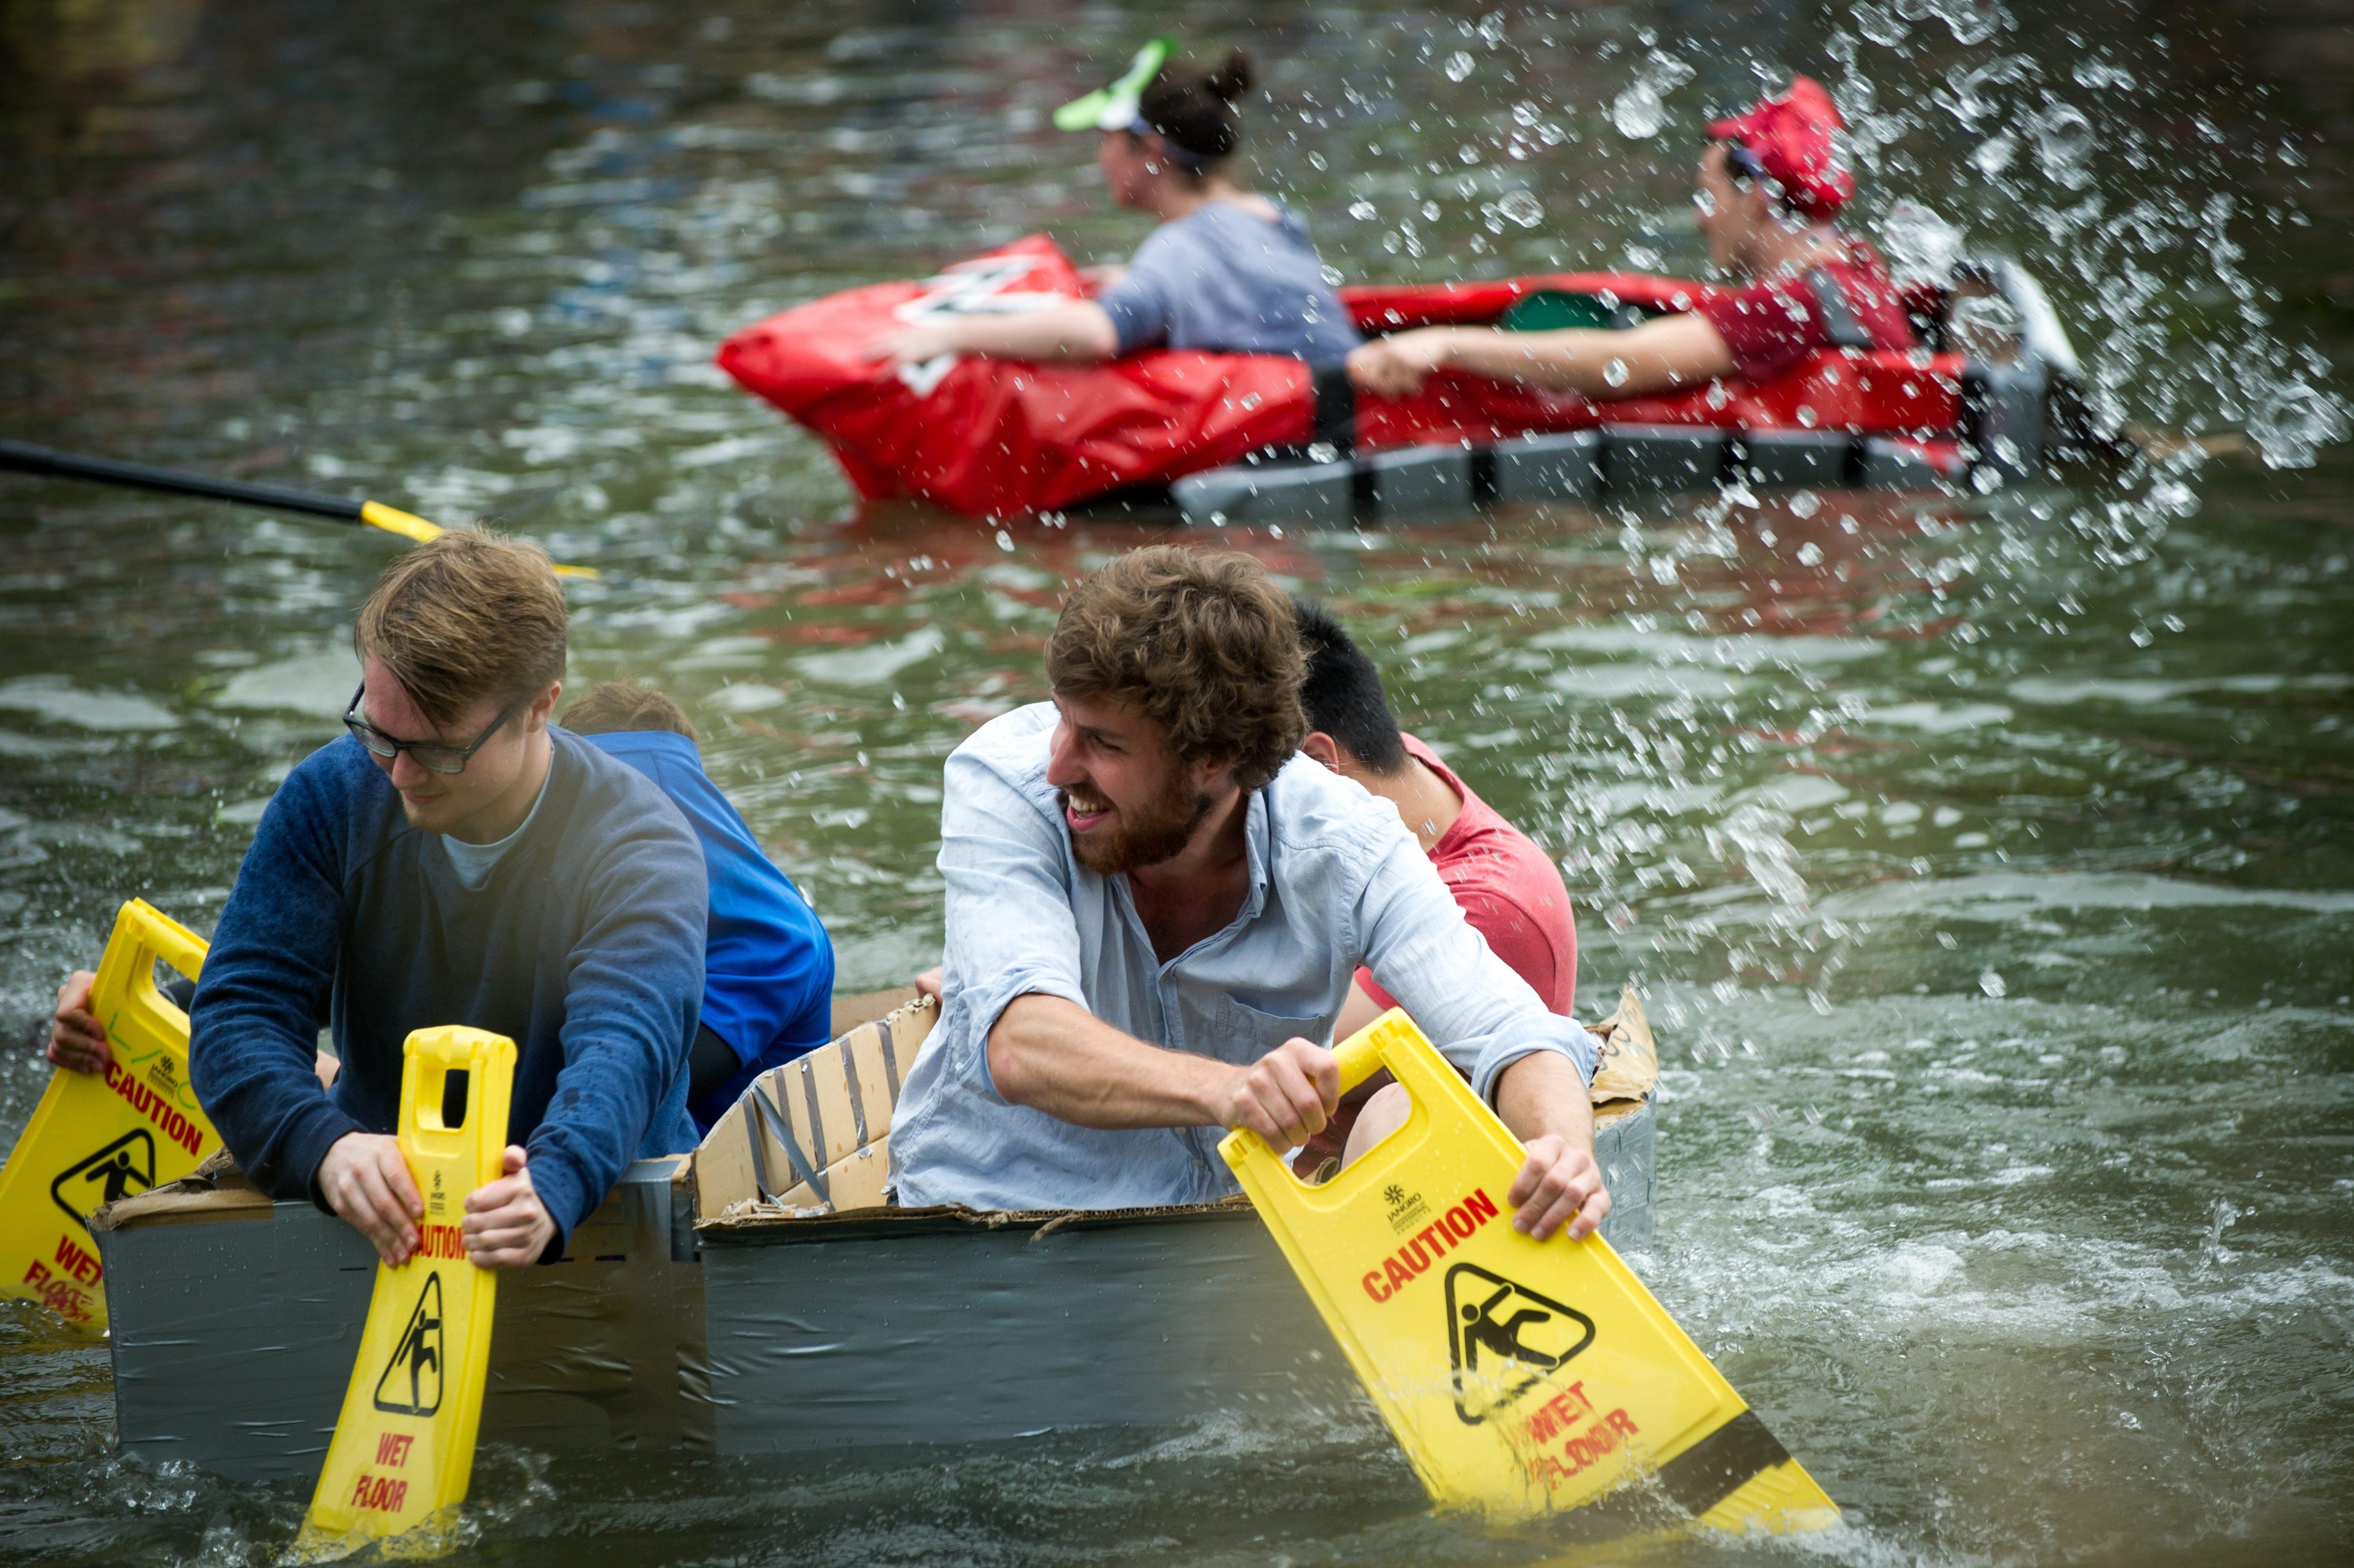 Suicide Sundy cardbard boat race on the river Cam in Cambridge